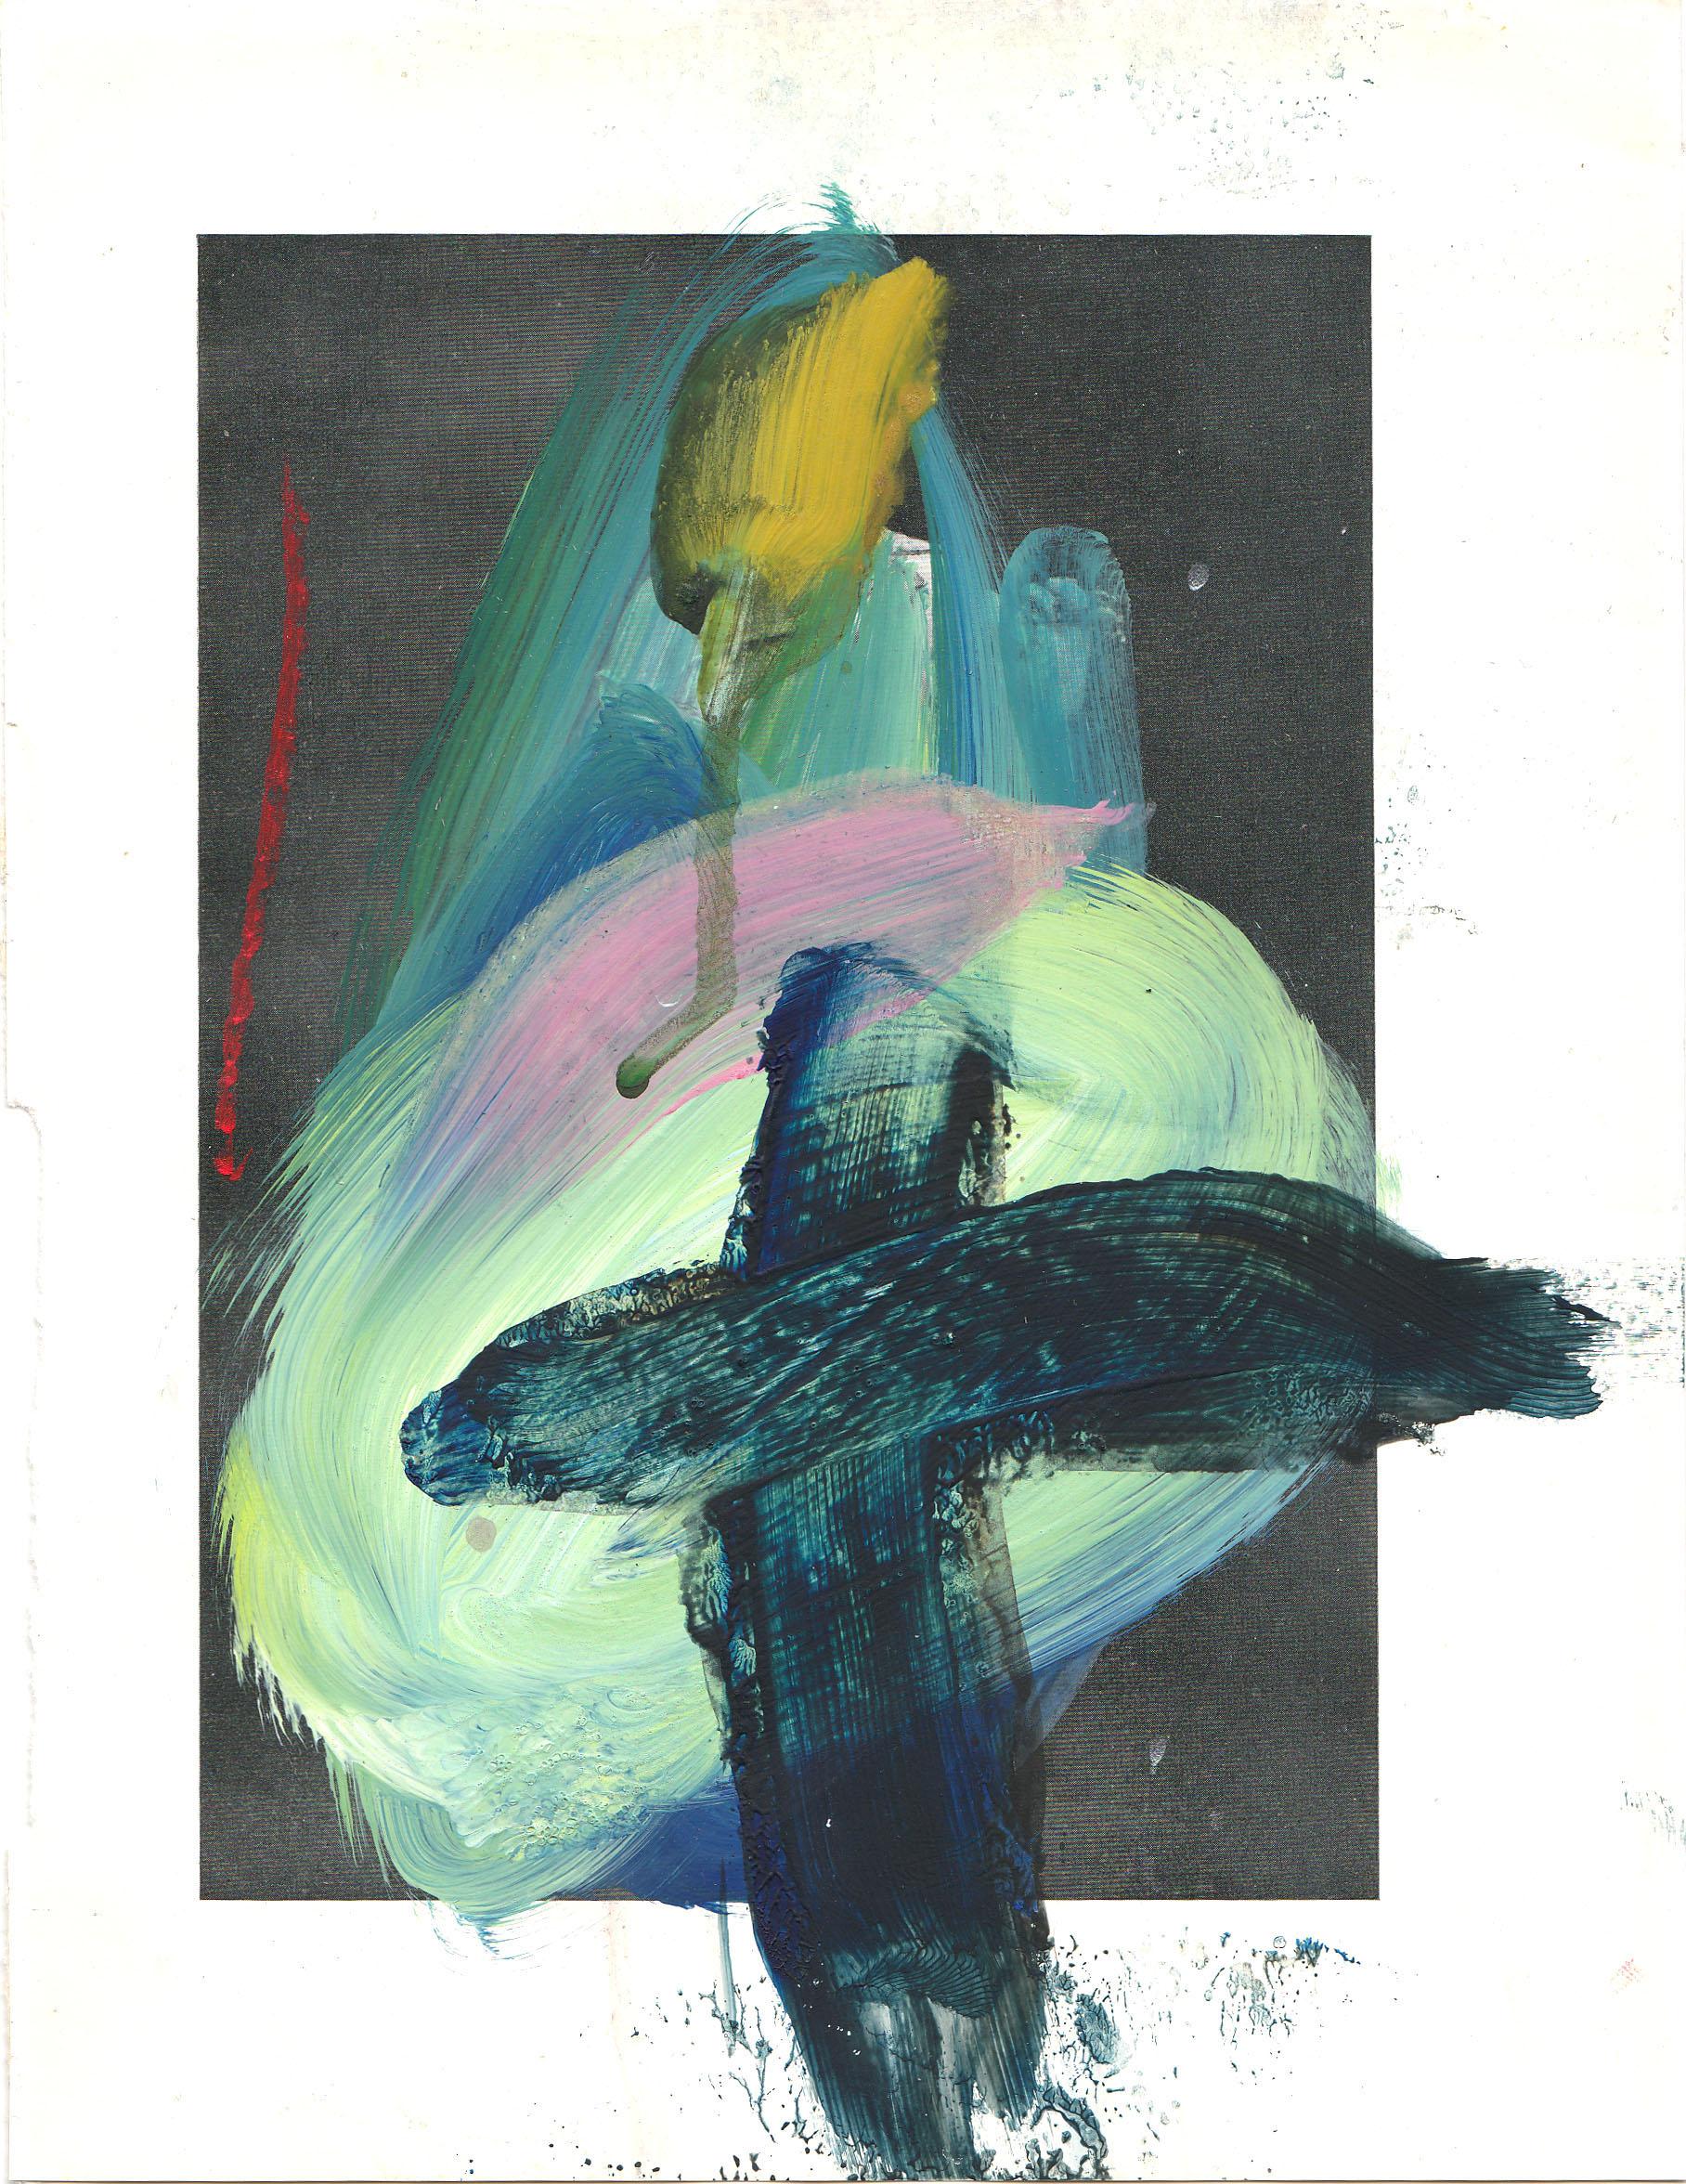 Caroline Pedler Ode to Antoni 15 x 21 cm  acrylic on paper  £ 425